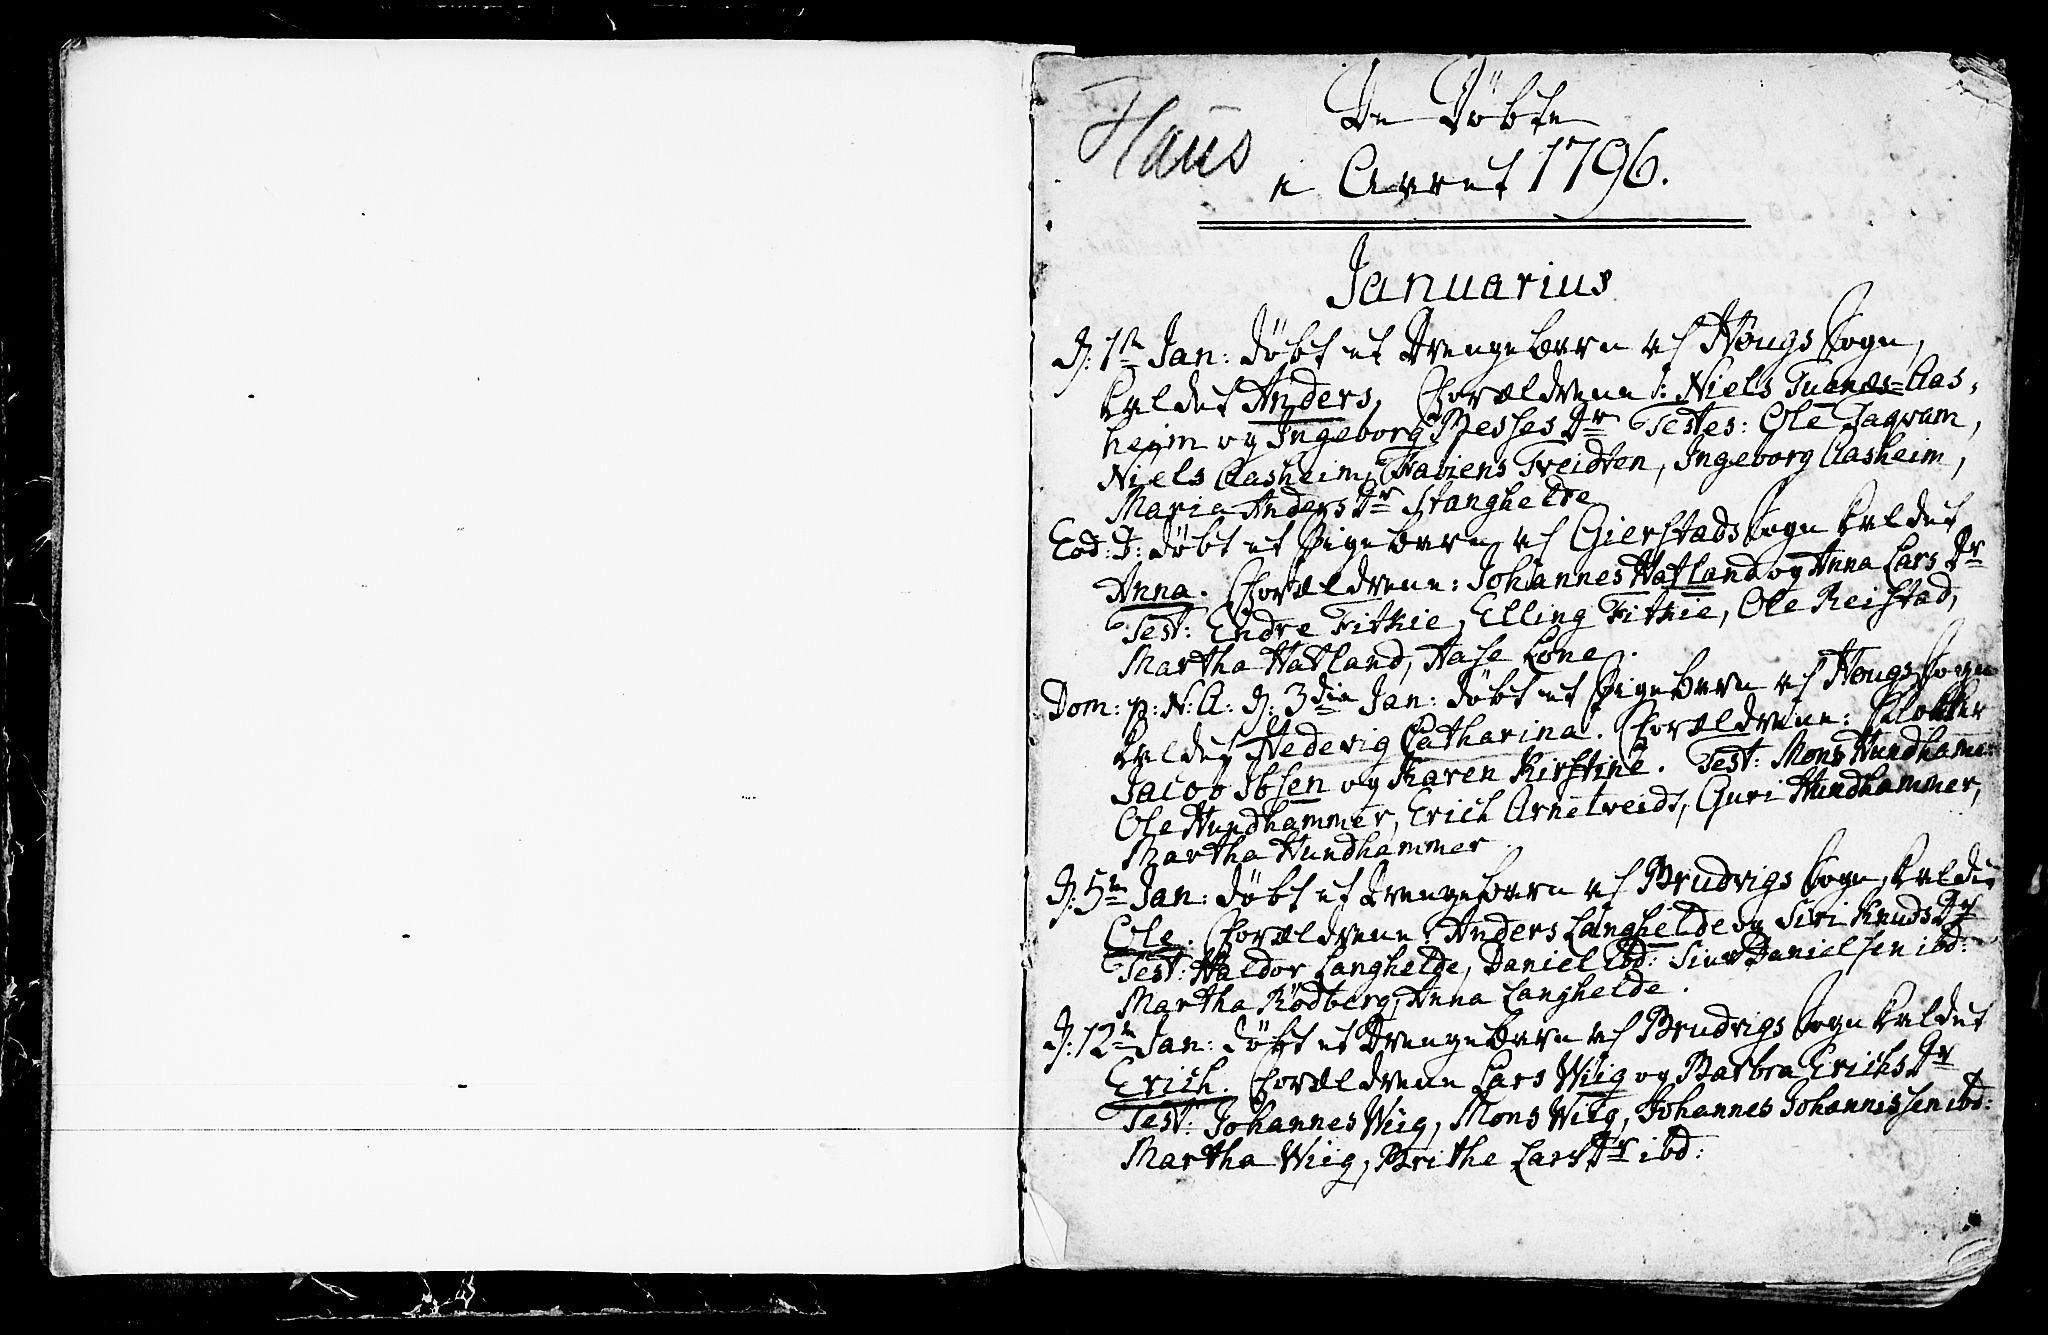 SAB, Haus sokneprestembete, H/Haa: Ministerialbok nr. A 11, 1796-1816, s. 2